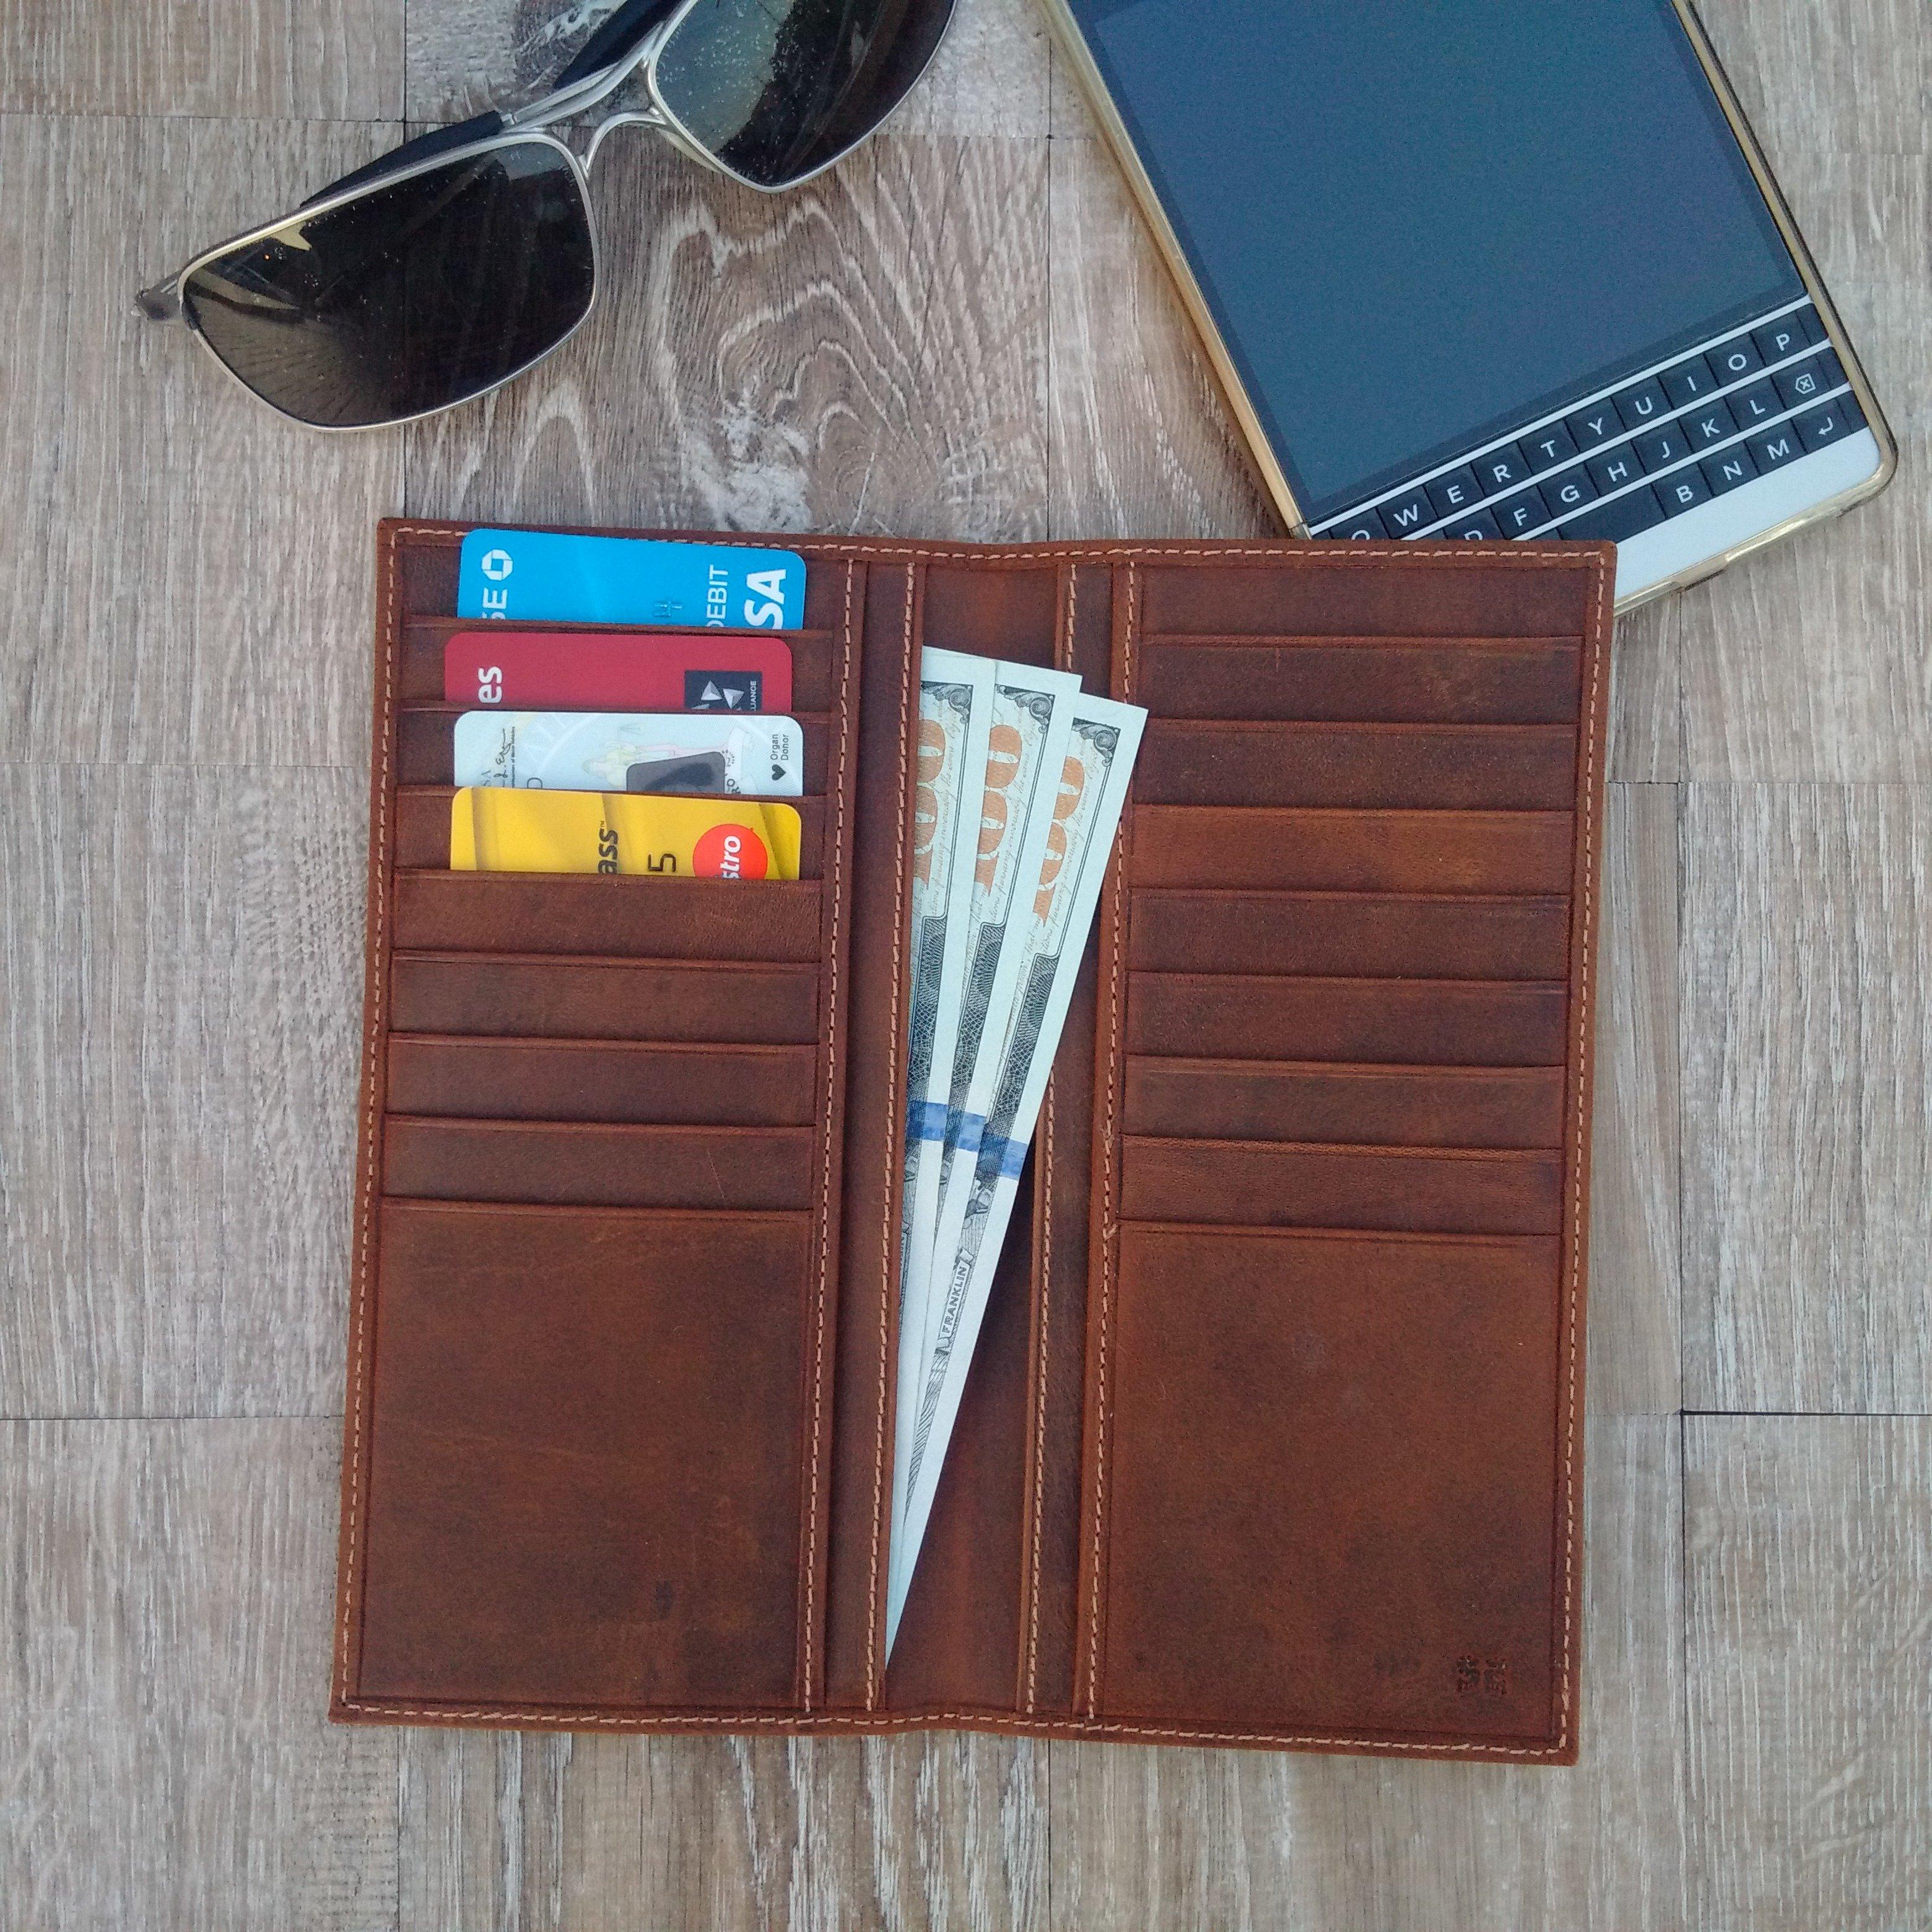 Wallet,Checkbook,Leather wallet,Fine leather wallet,Long wallet,Wallet gifts,Fine leather gifts,Checkbook,Pocketbook